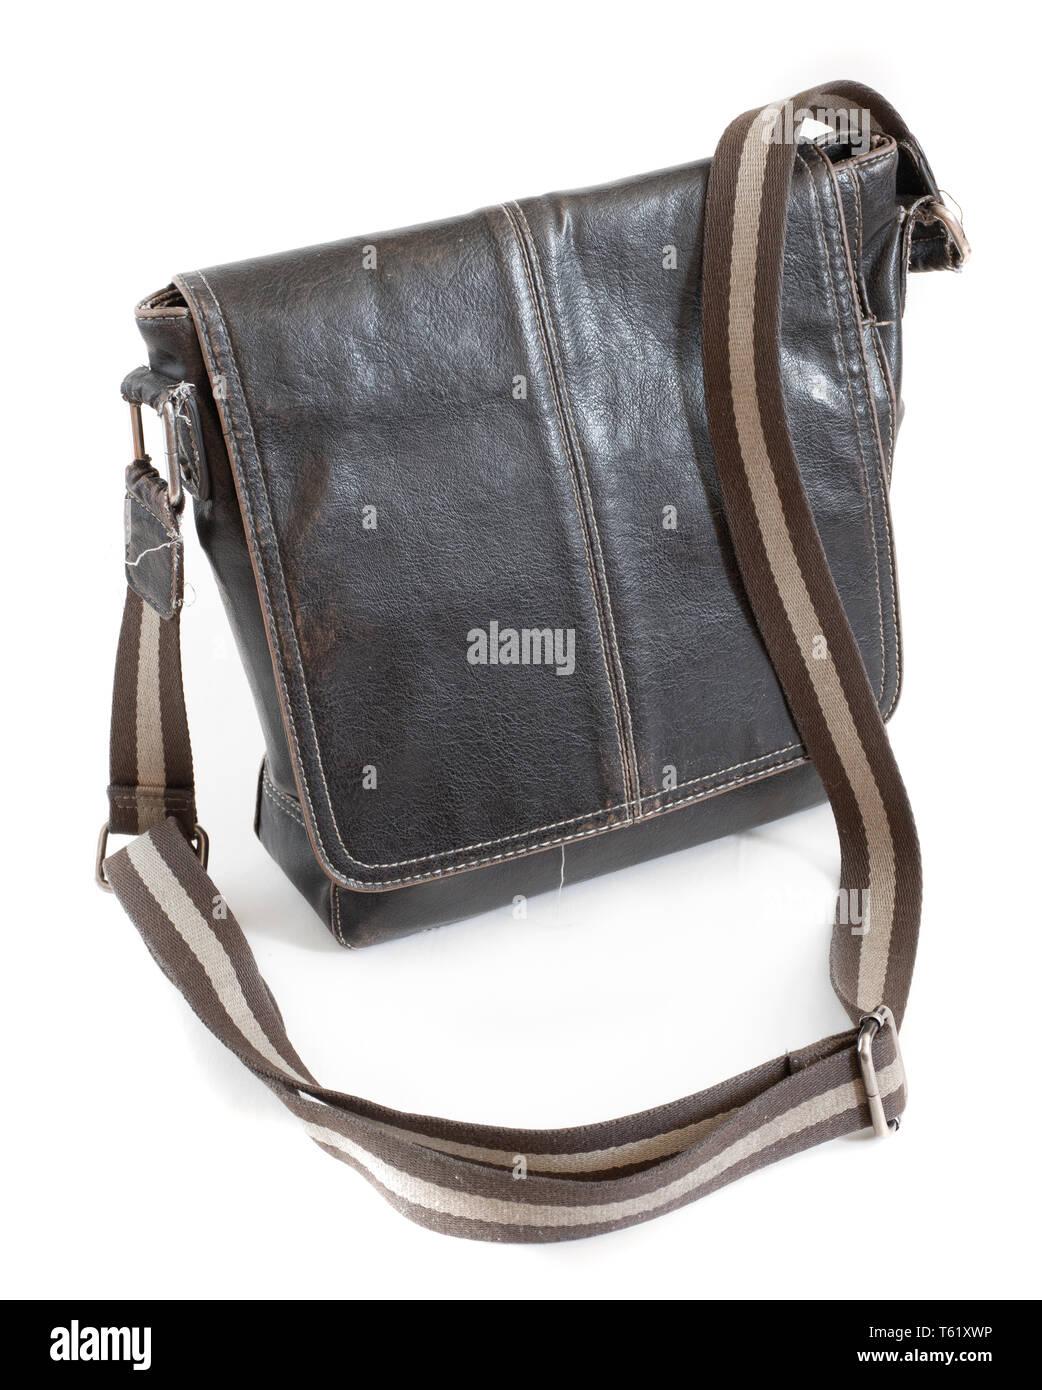 aa6442be675ba Isolated Closeup Leather Zipper Purse Stockfotos   Isolated Closeup ...